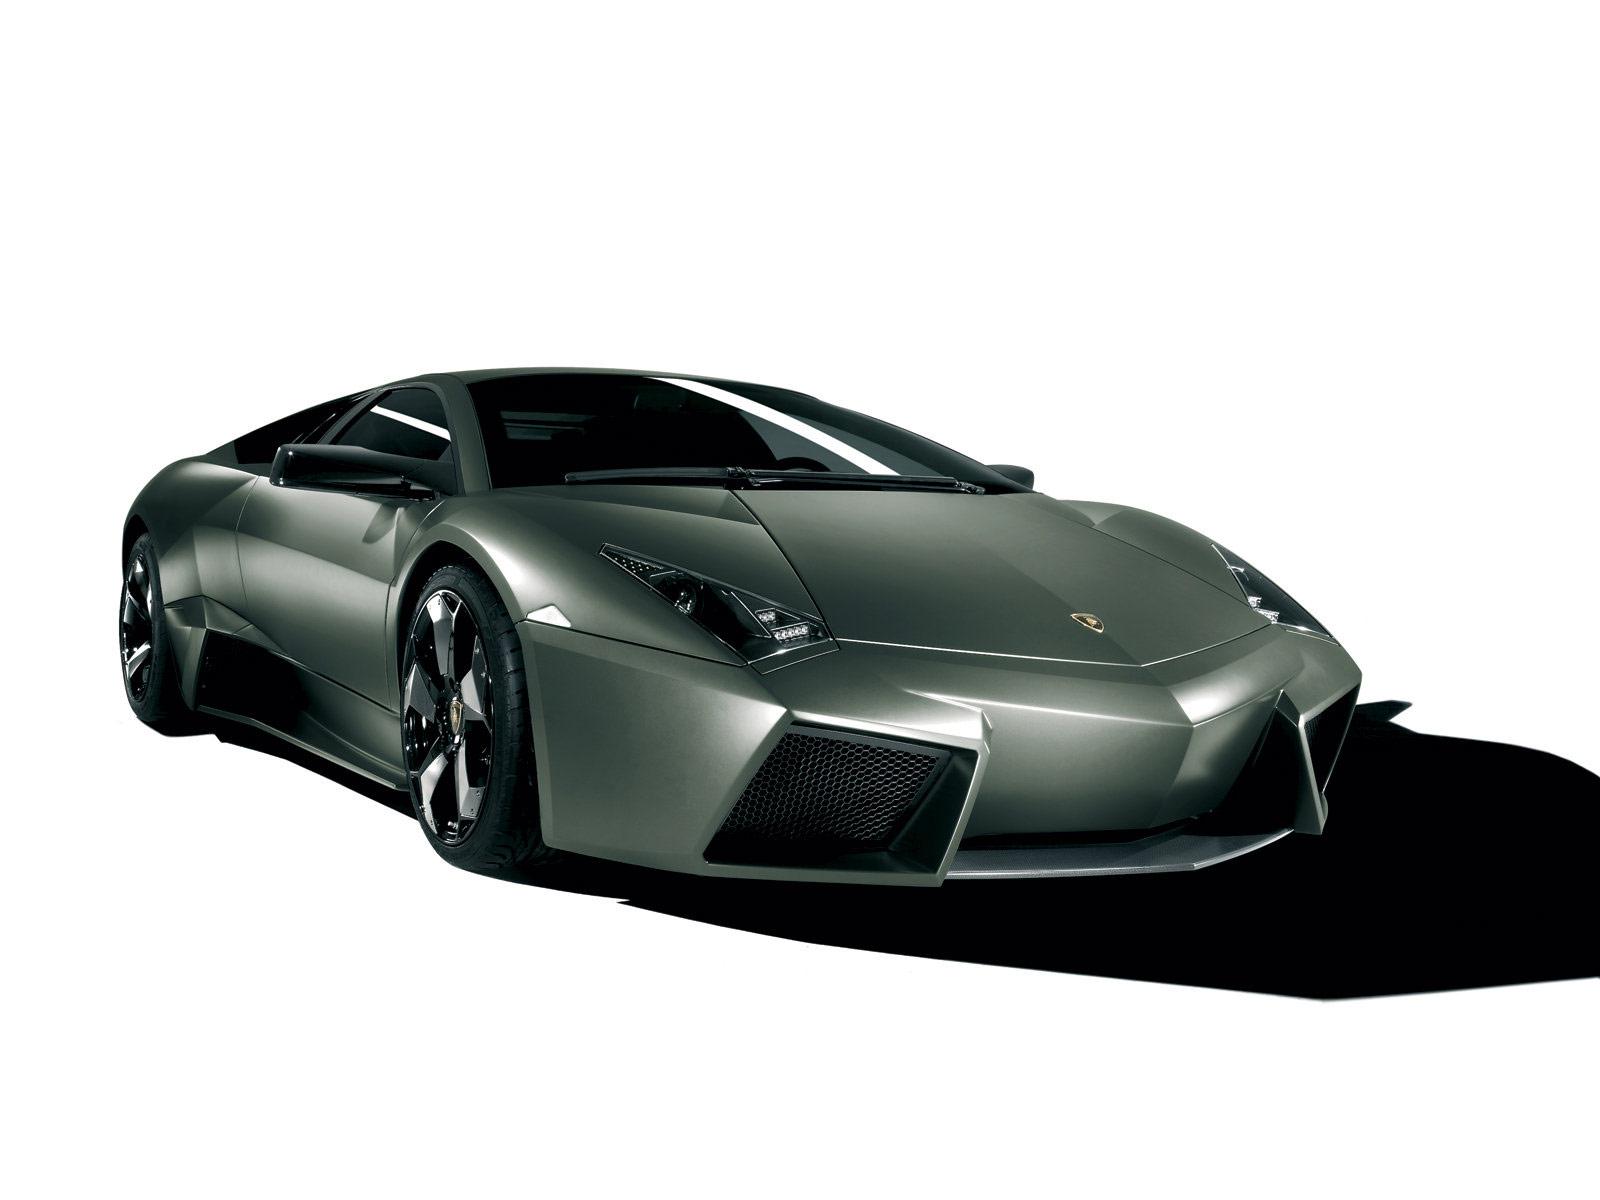 Gambar Mobil Lamborghini: Gambar Mobil LAMBORGHINI Reventon 2008